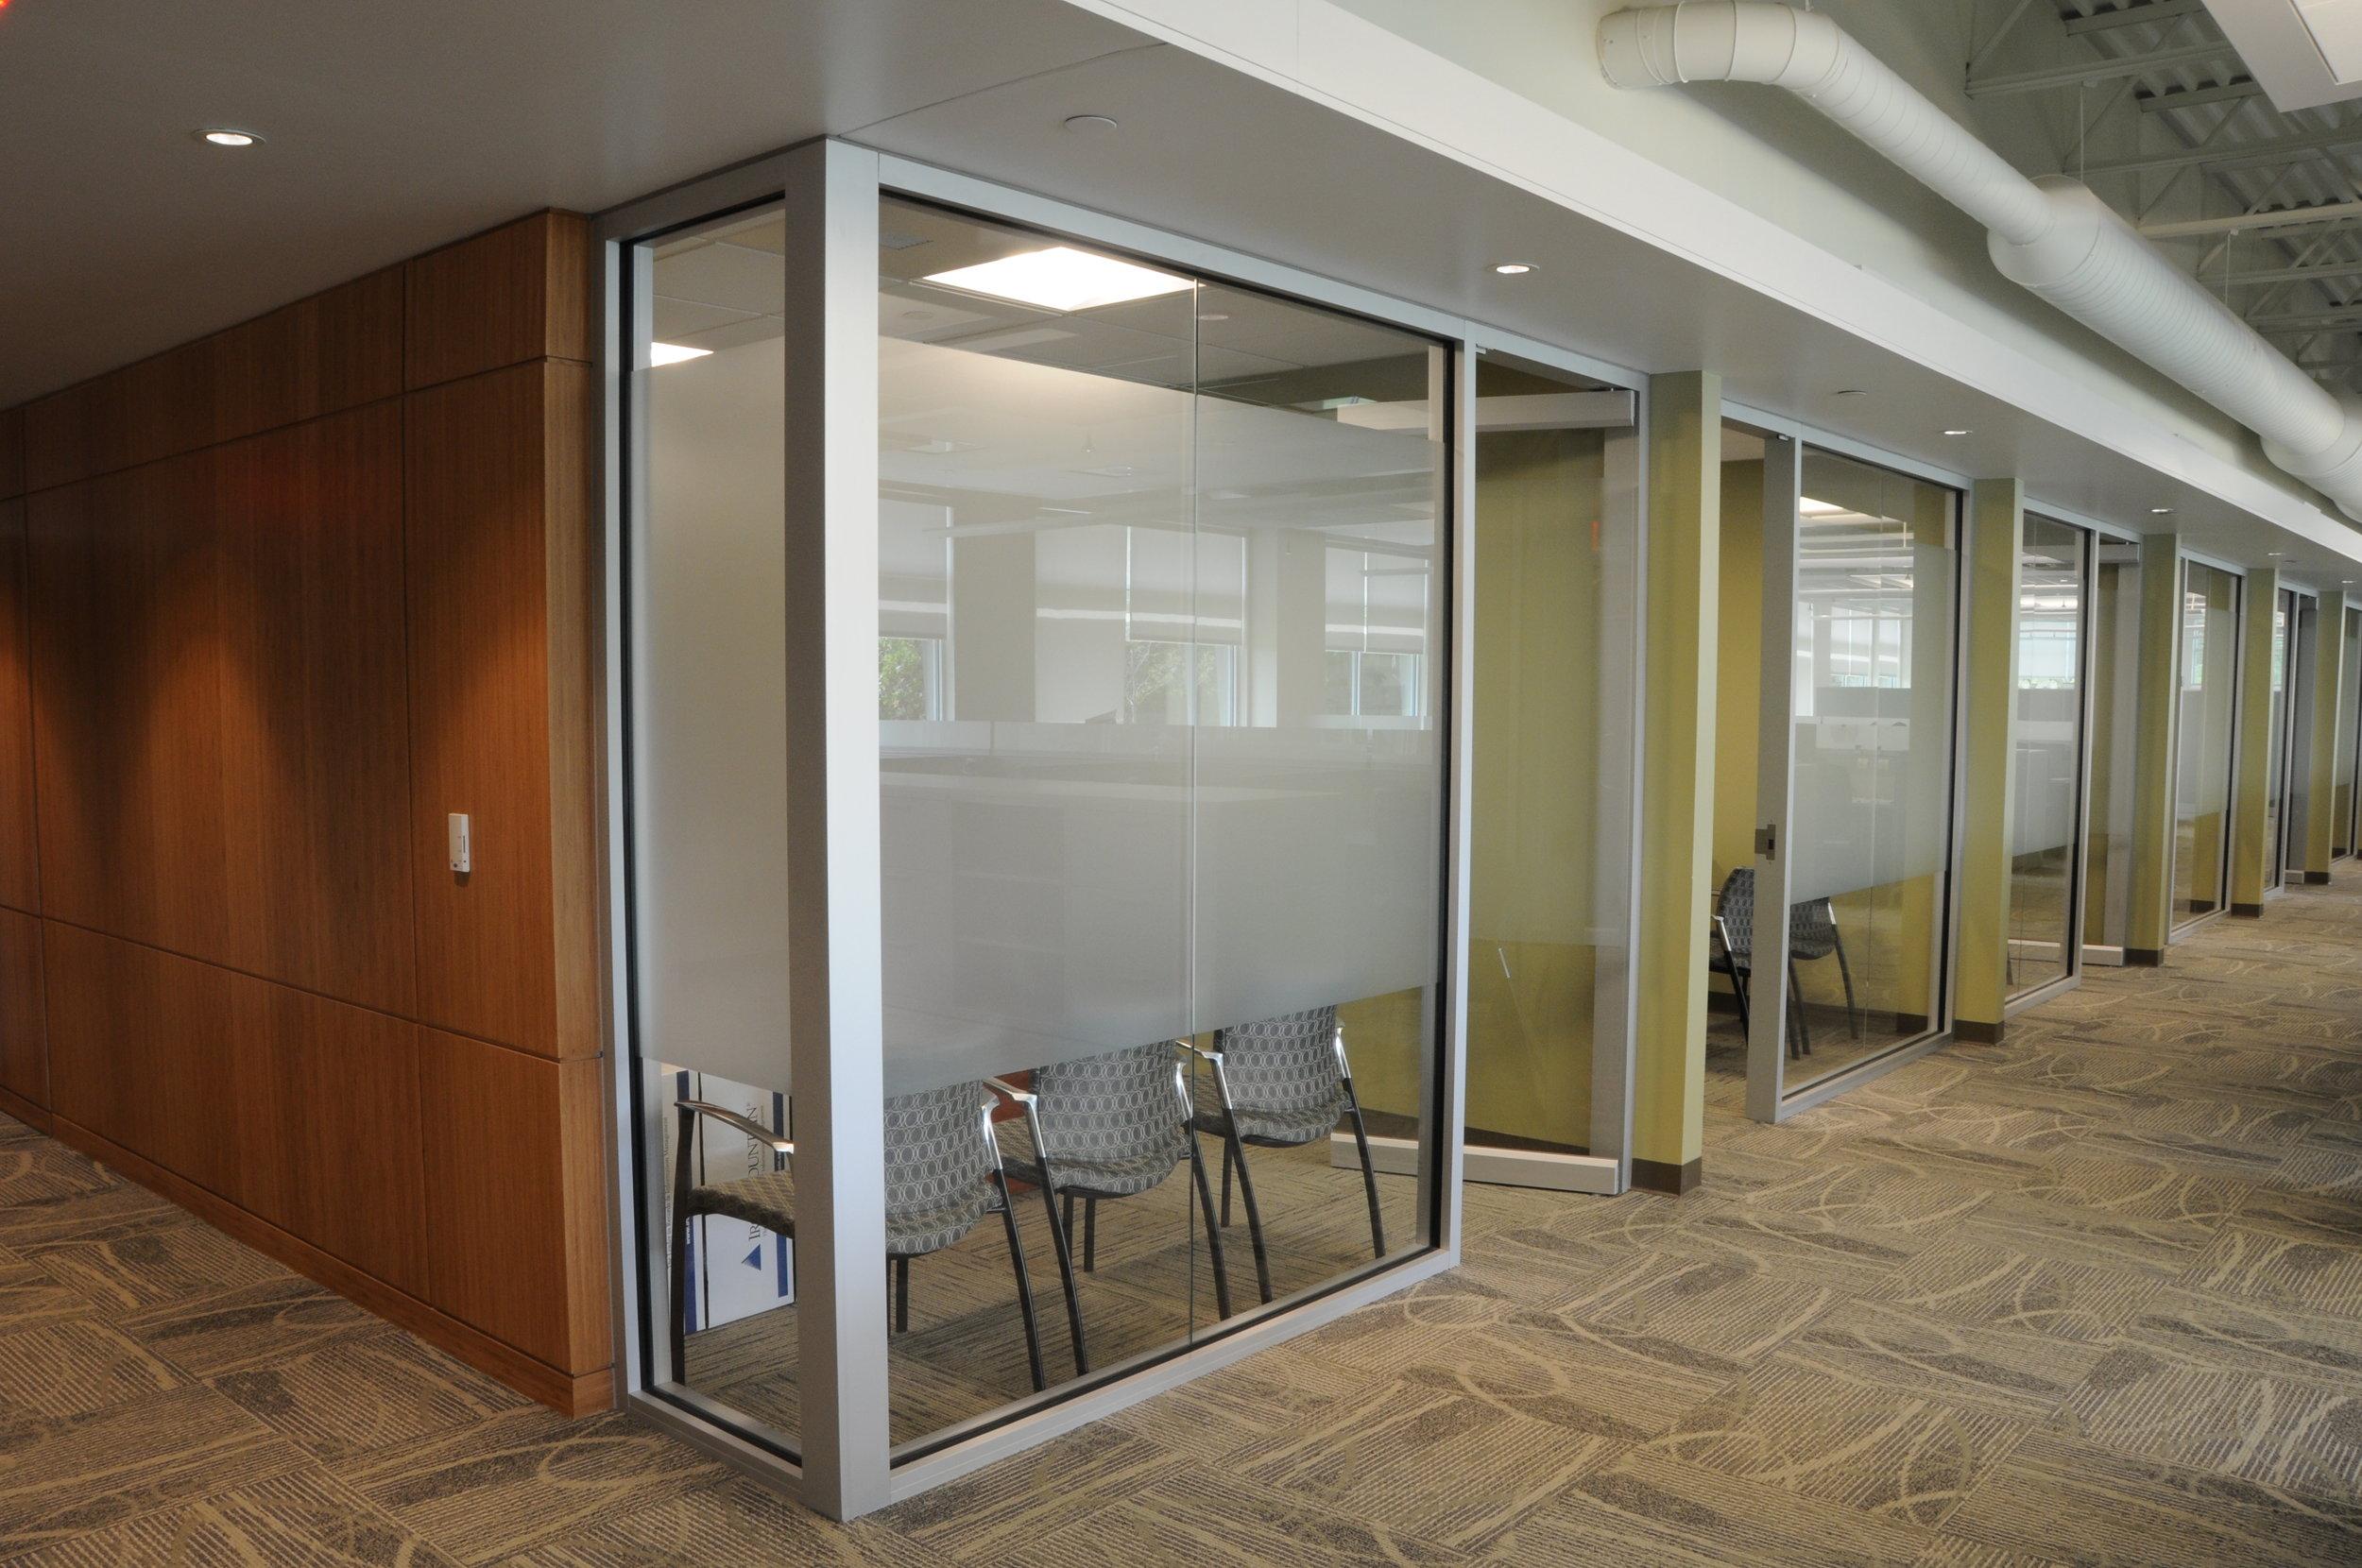 morphotek office lab 091611 (56).JPG